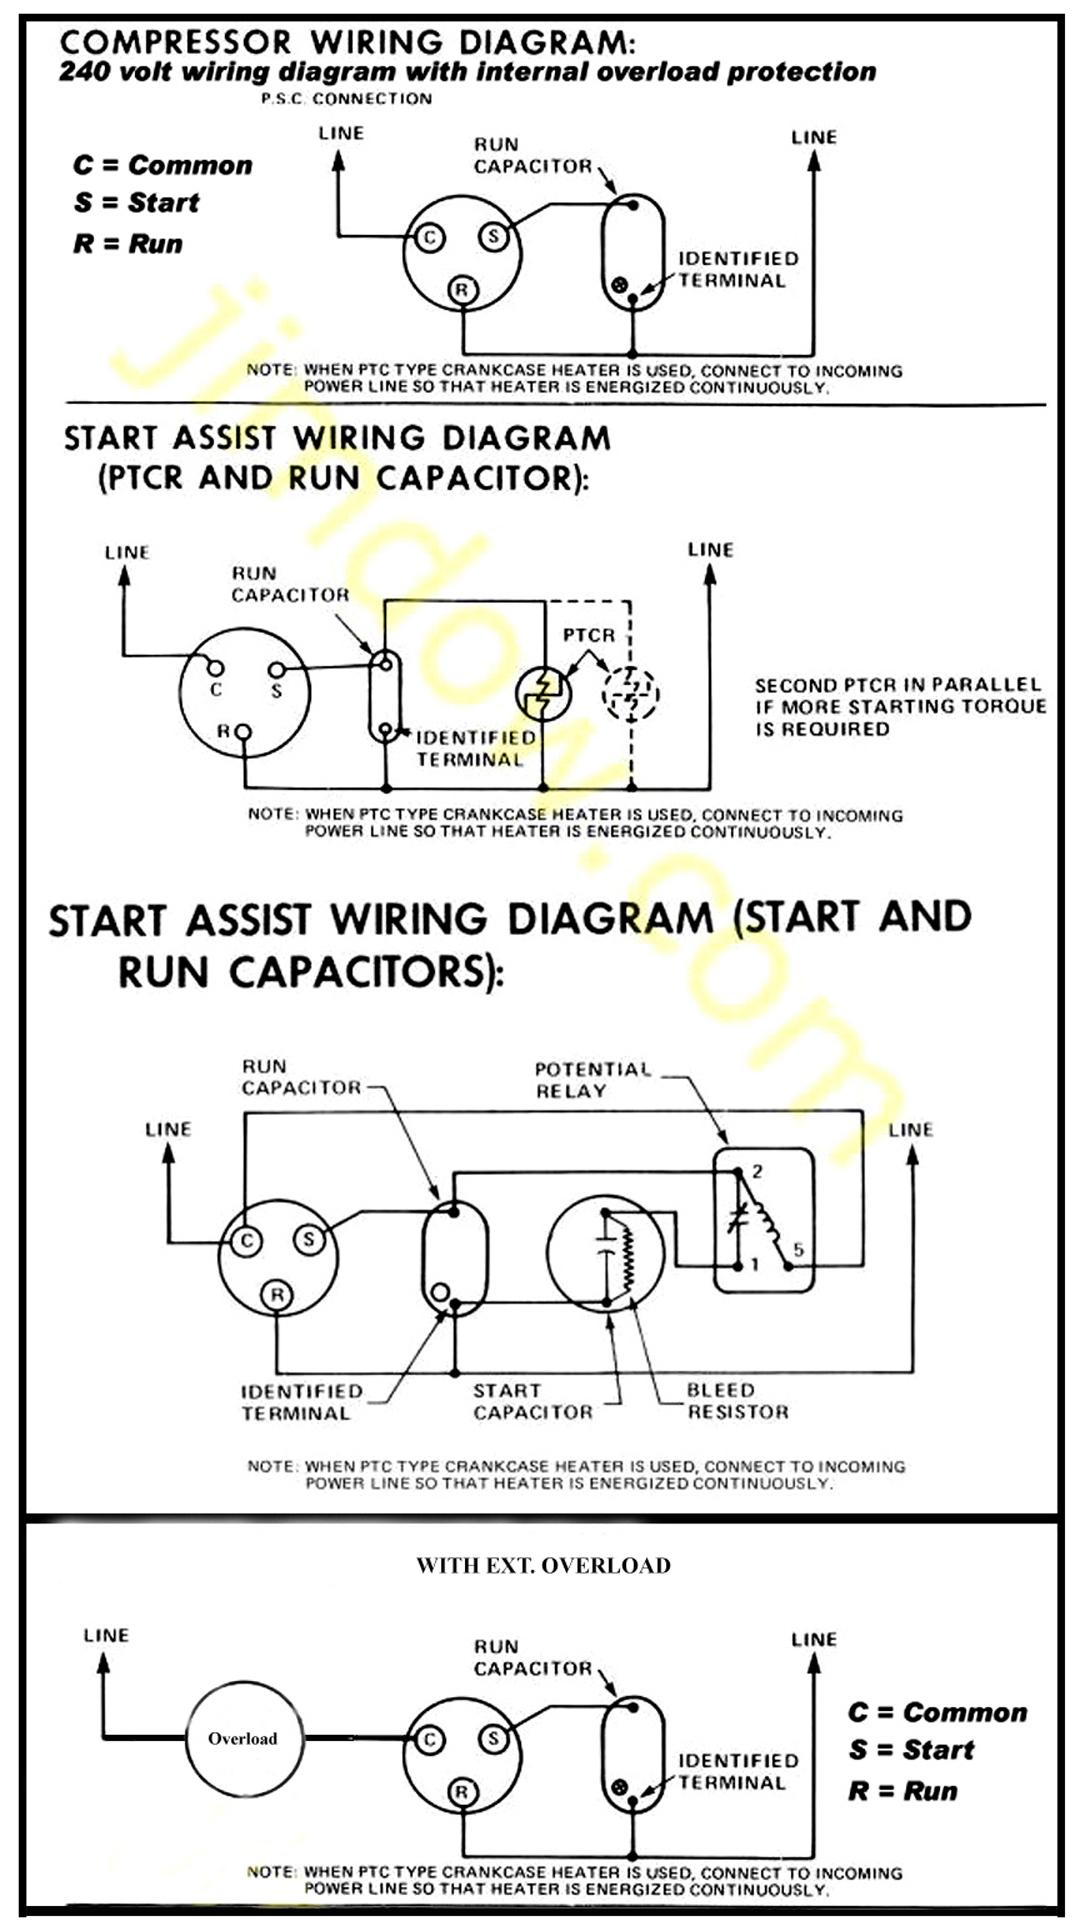 Heat Pump Compressor Wiring Diagram | Manual E-Books - Compressor Wiring Diagram